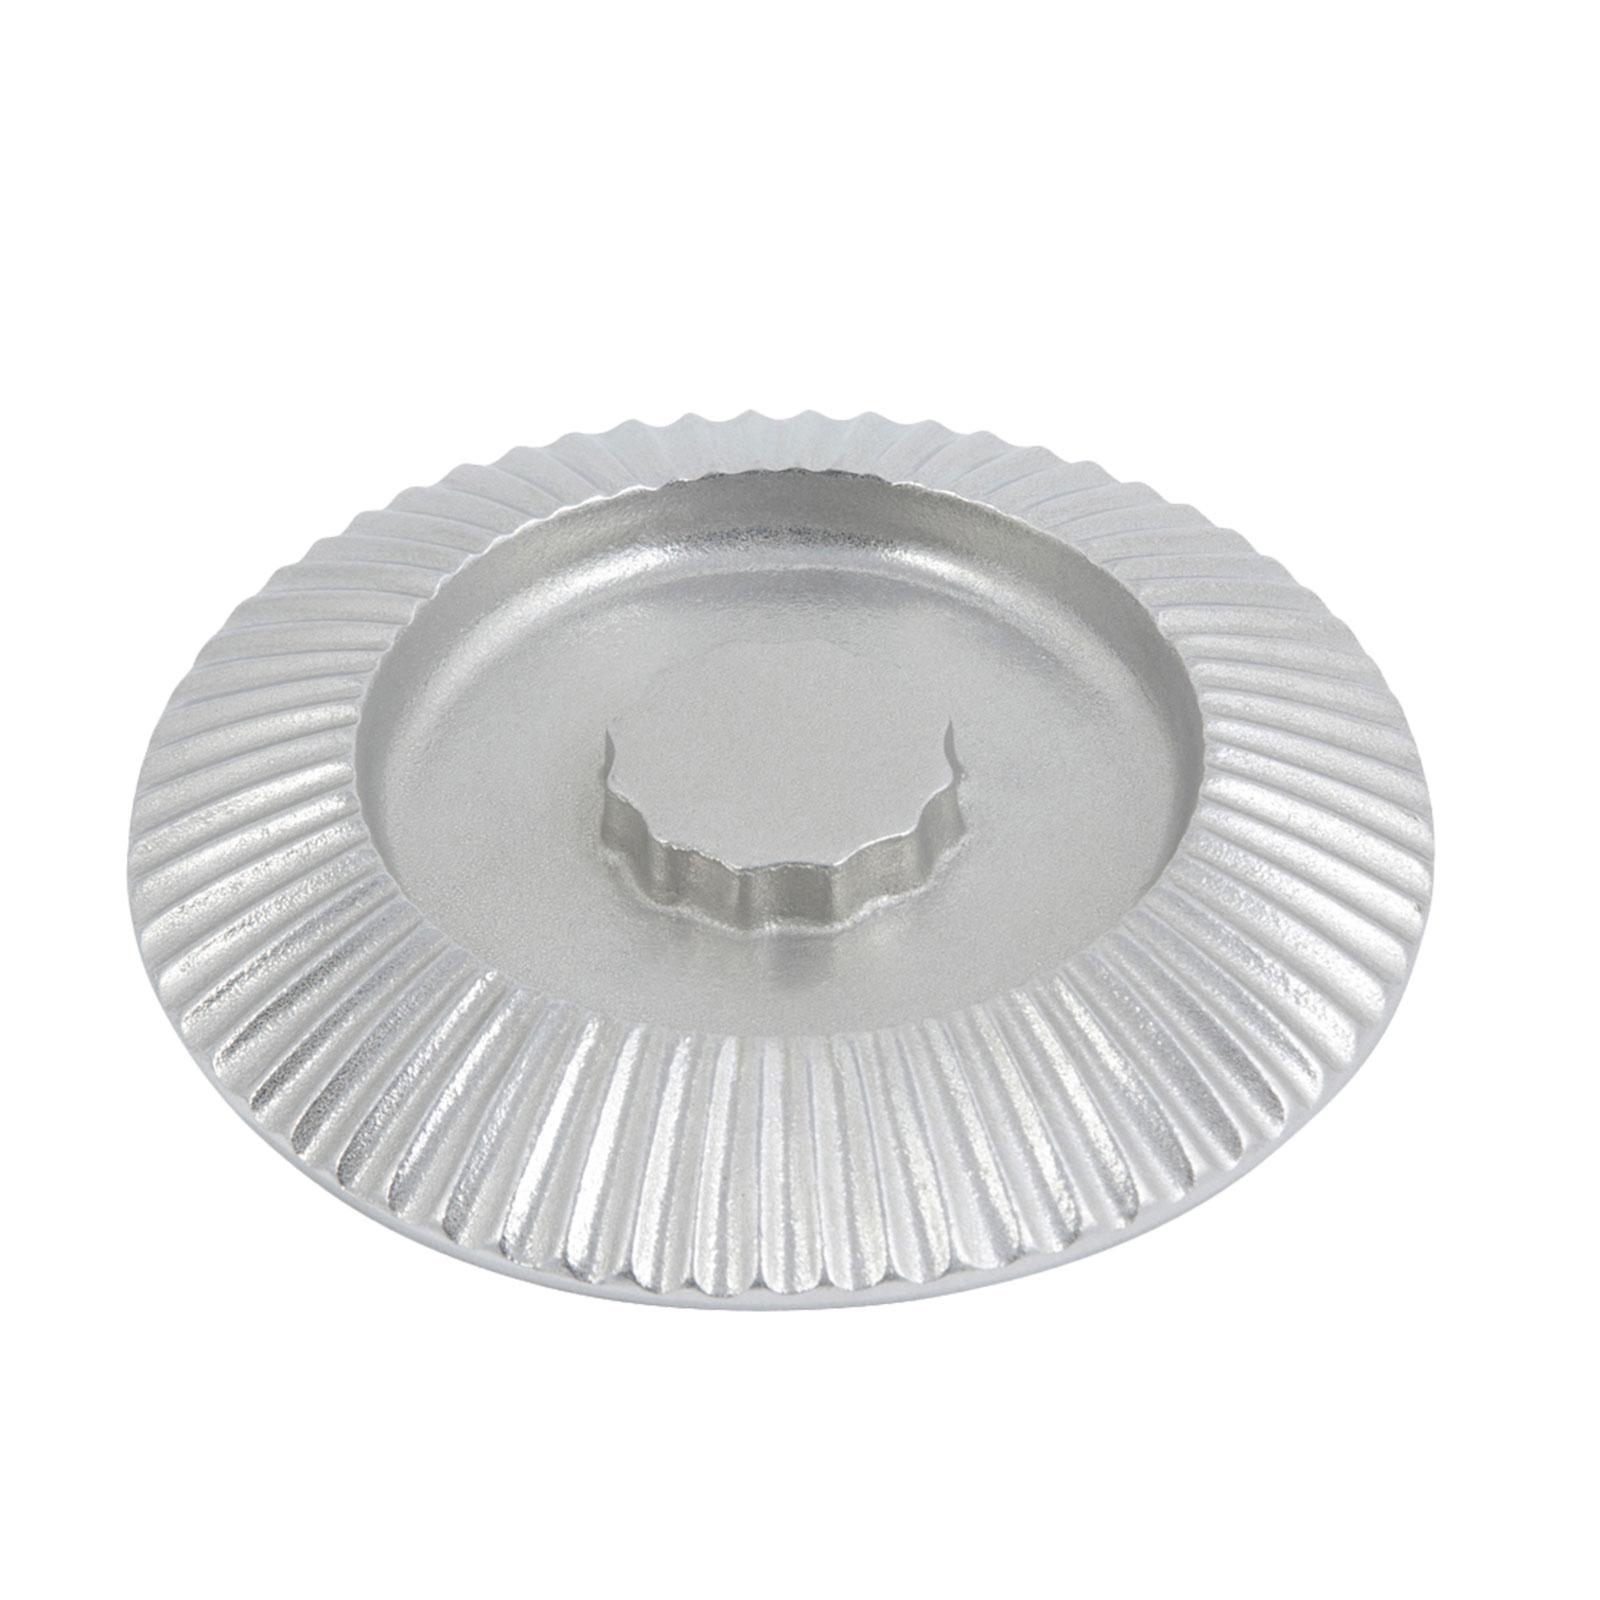 Bon Chef 9000CP Tortilla Bowl Cover, Aluminum/Pewter-Glo